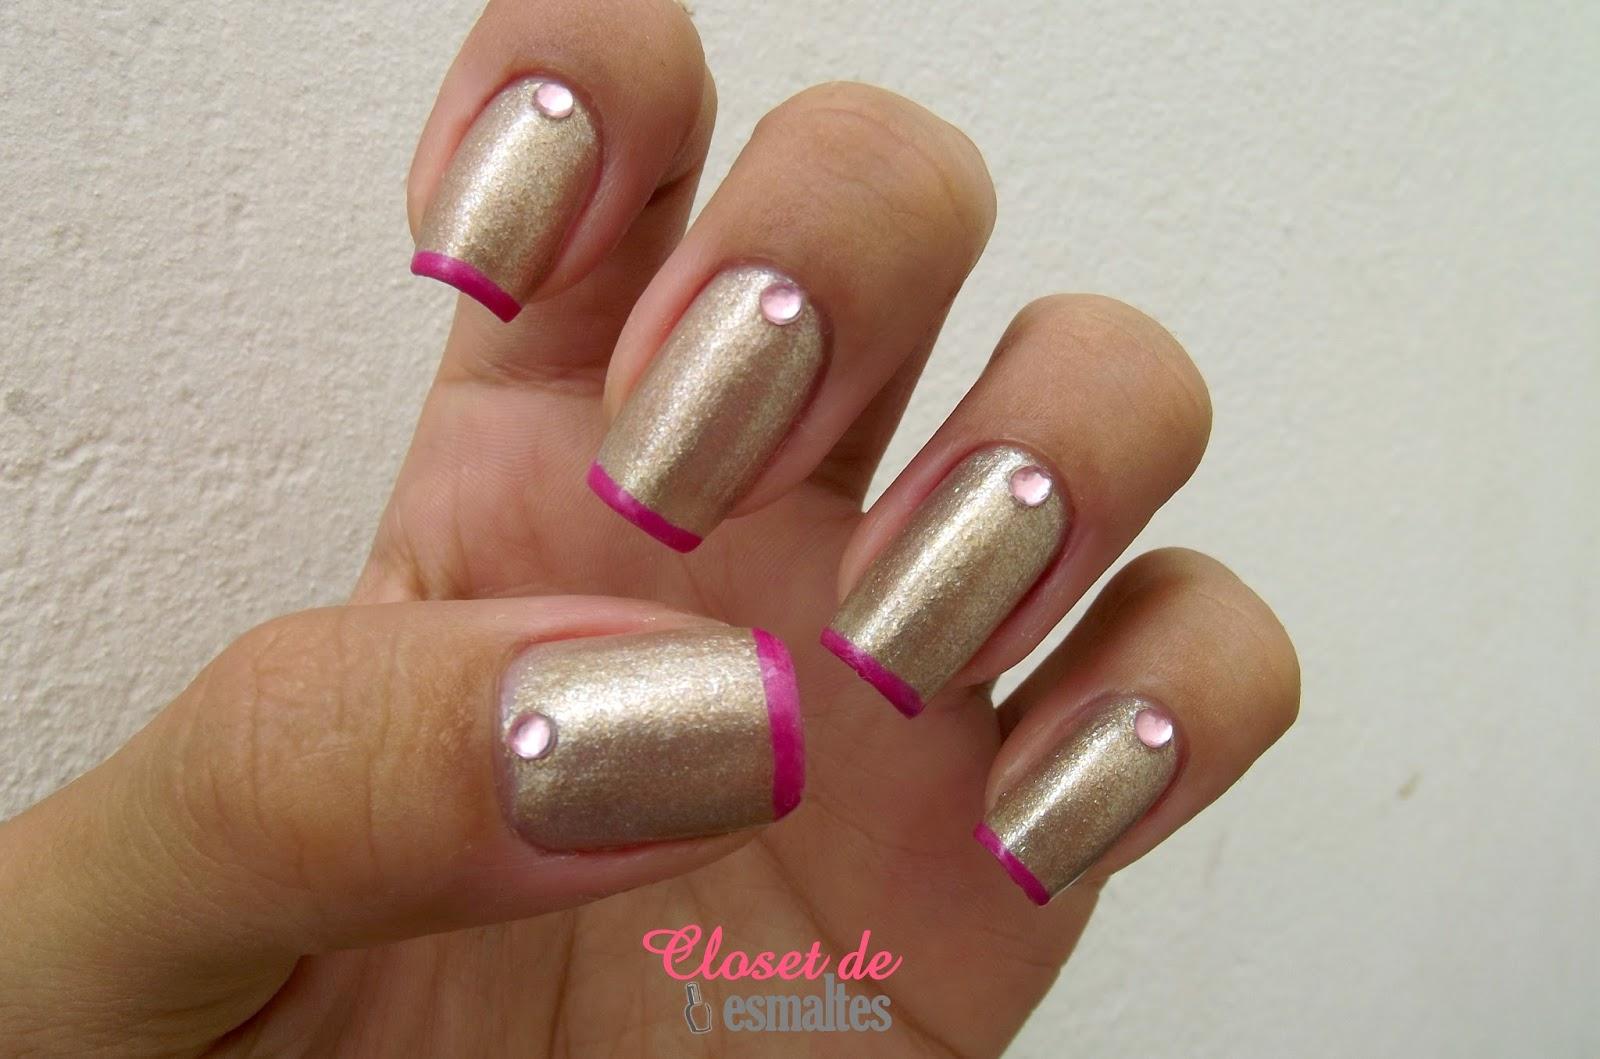 Francesinha Rosa, esmalte musa avon, esmalte magic flow hits, esmaltes, unhas, nail art, francesinha, closet de esmaltes,